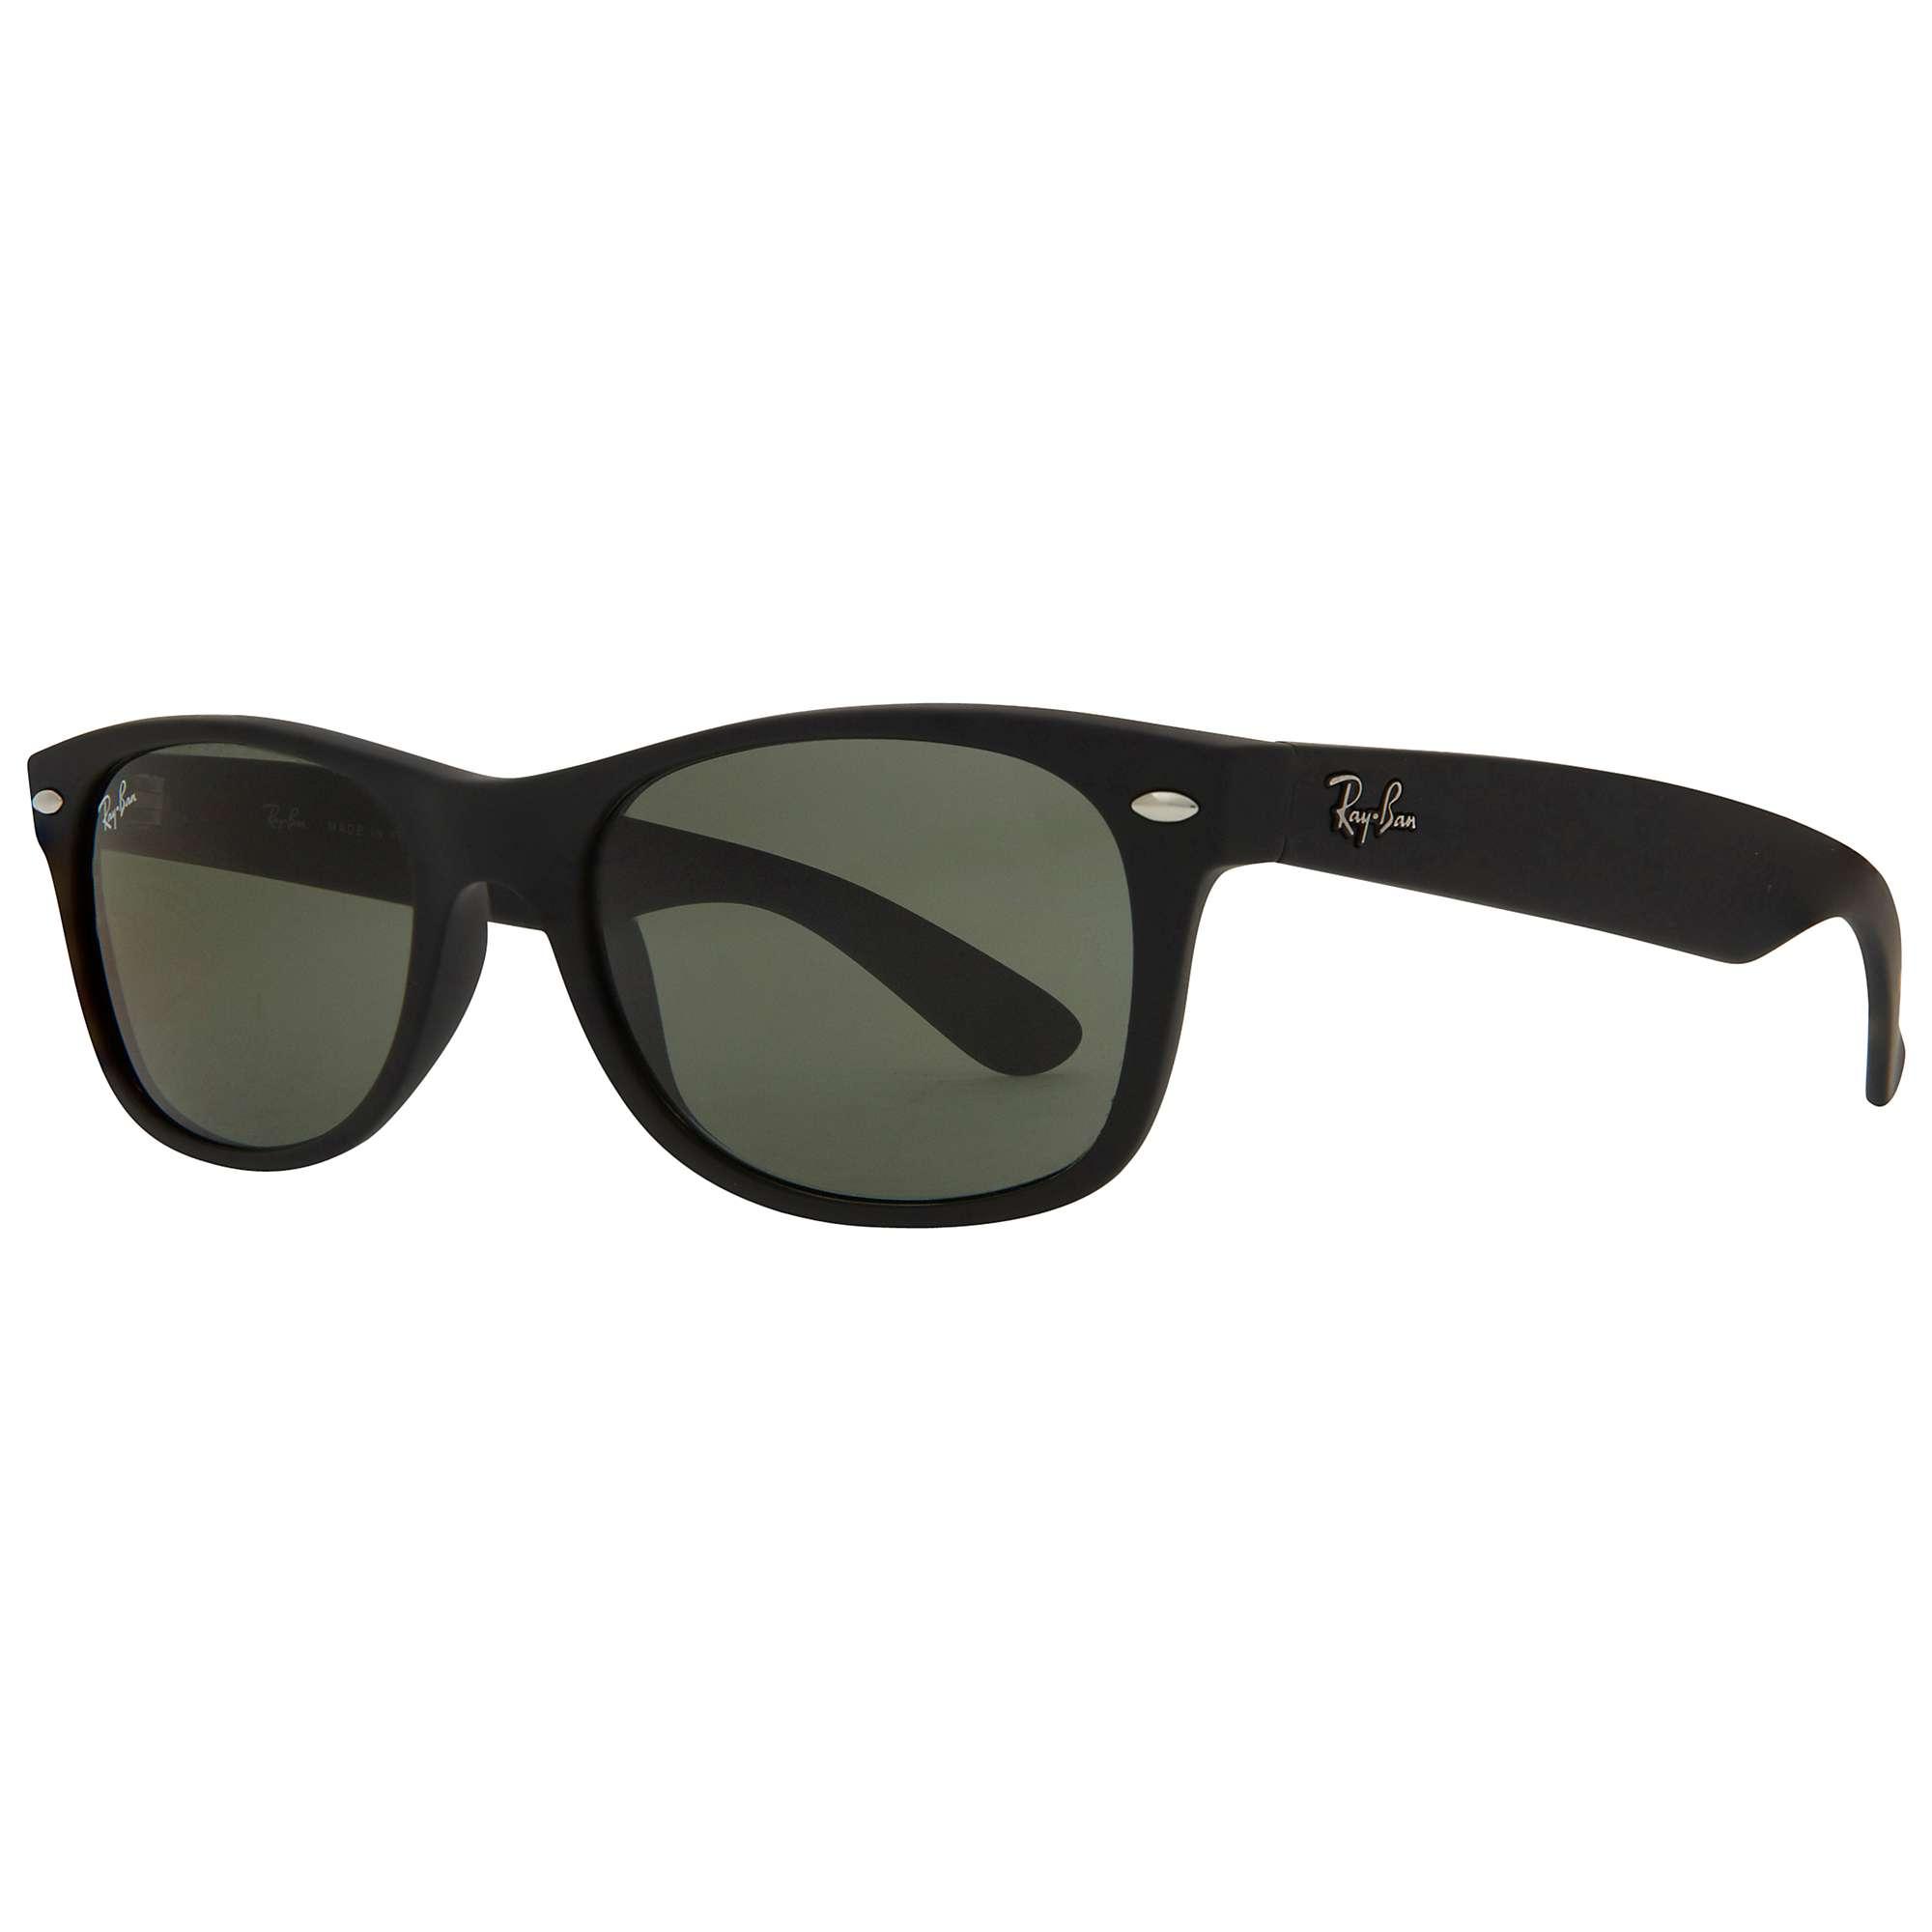 Ray Ban RB20 New Wayfarer Sunglasses, Matte Black